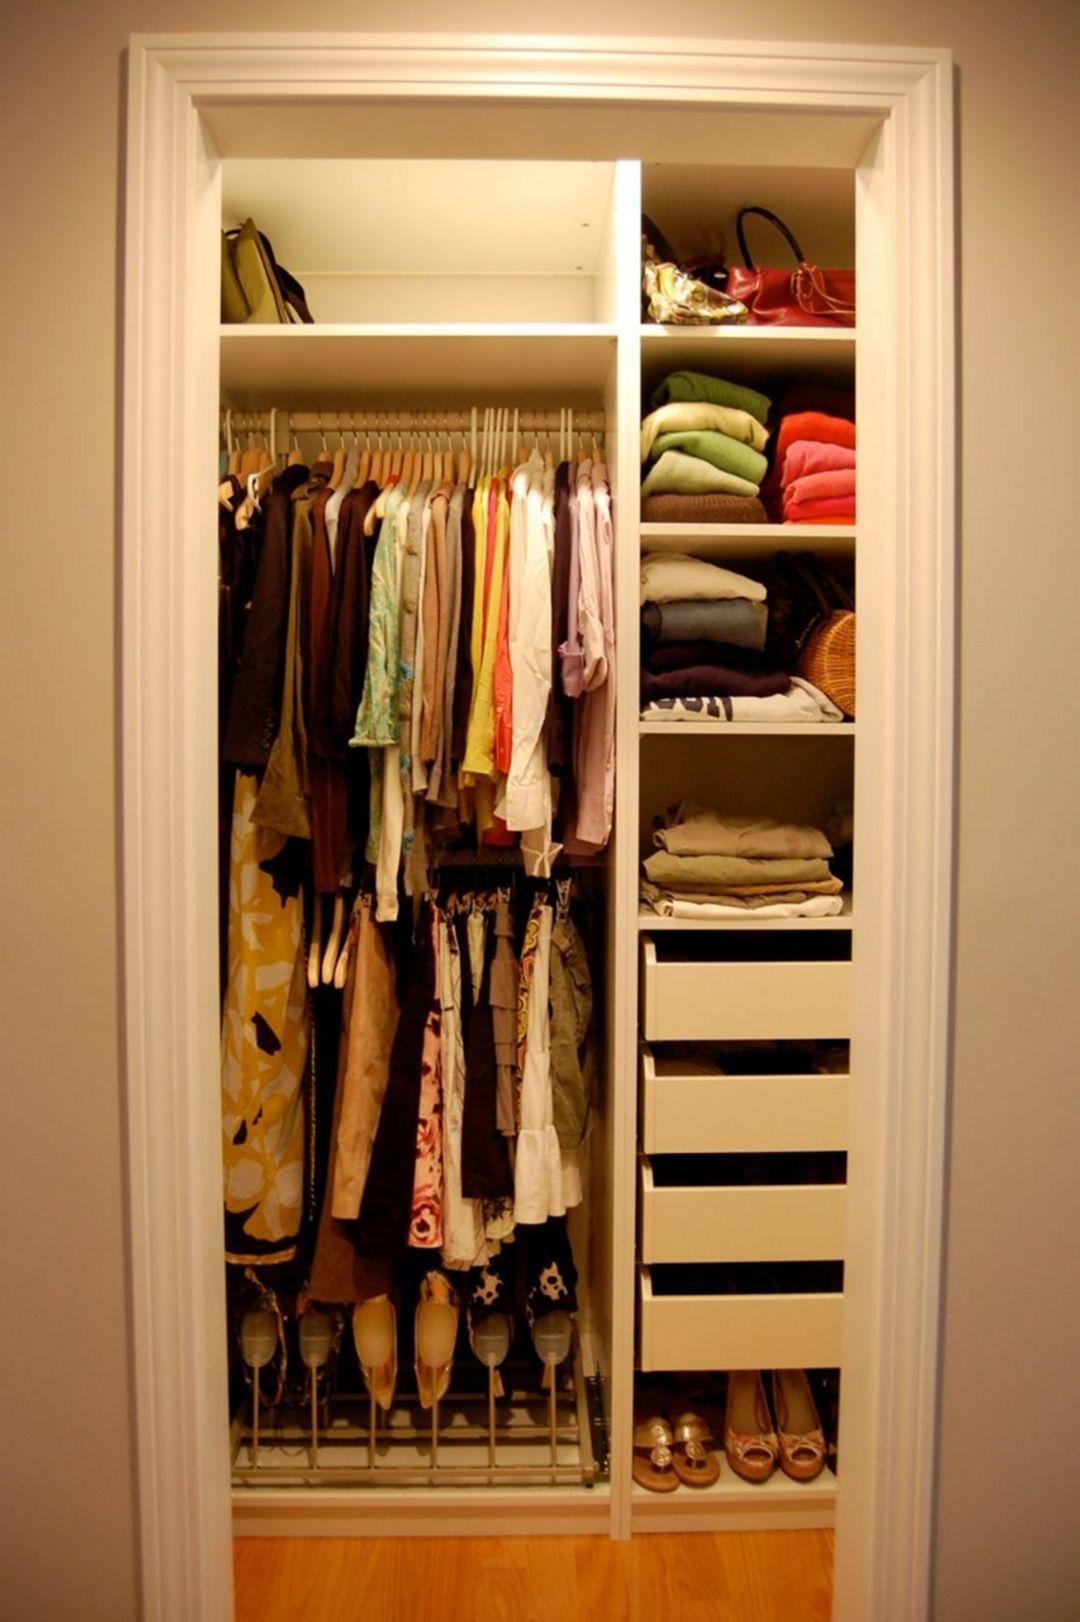 15 Amazing Closet Room Design Ideas For The Beauty Of Your Storage Design Decorating Closet Layout Small Closet Design Bedroom Organization Closet